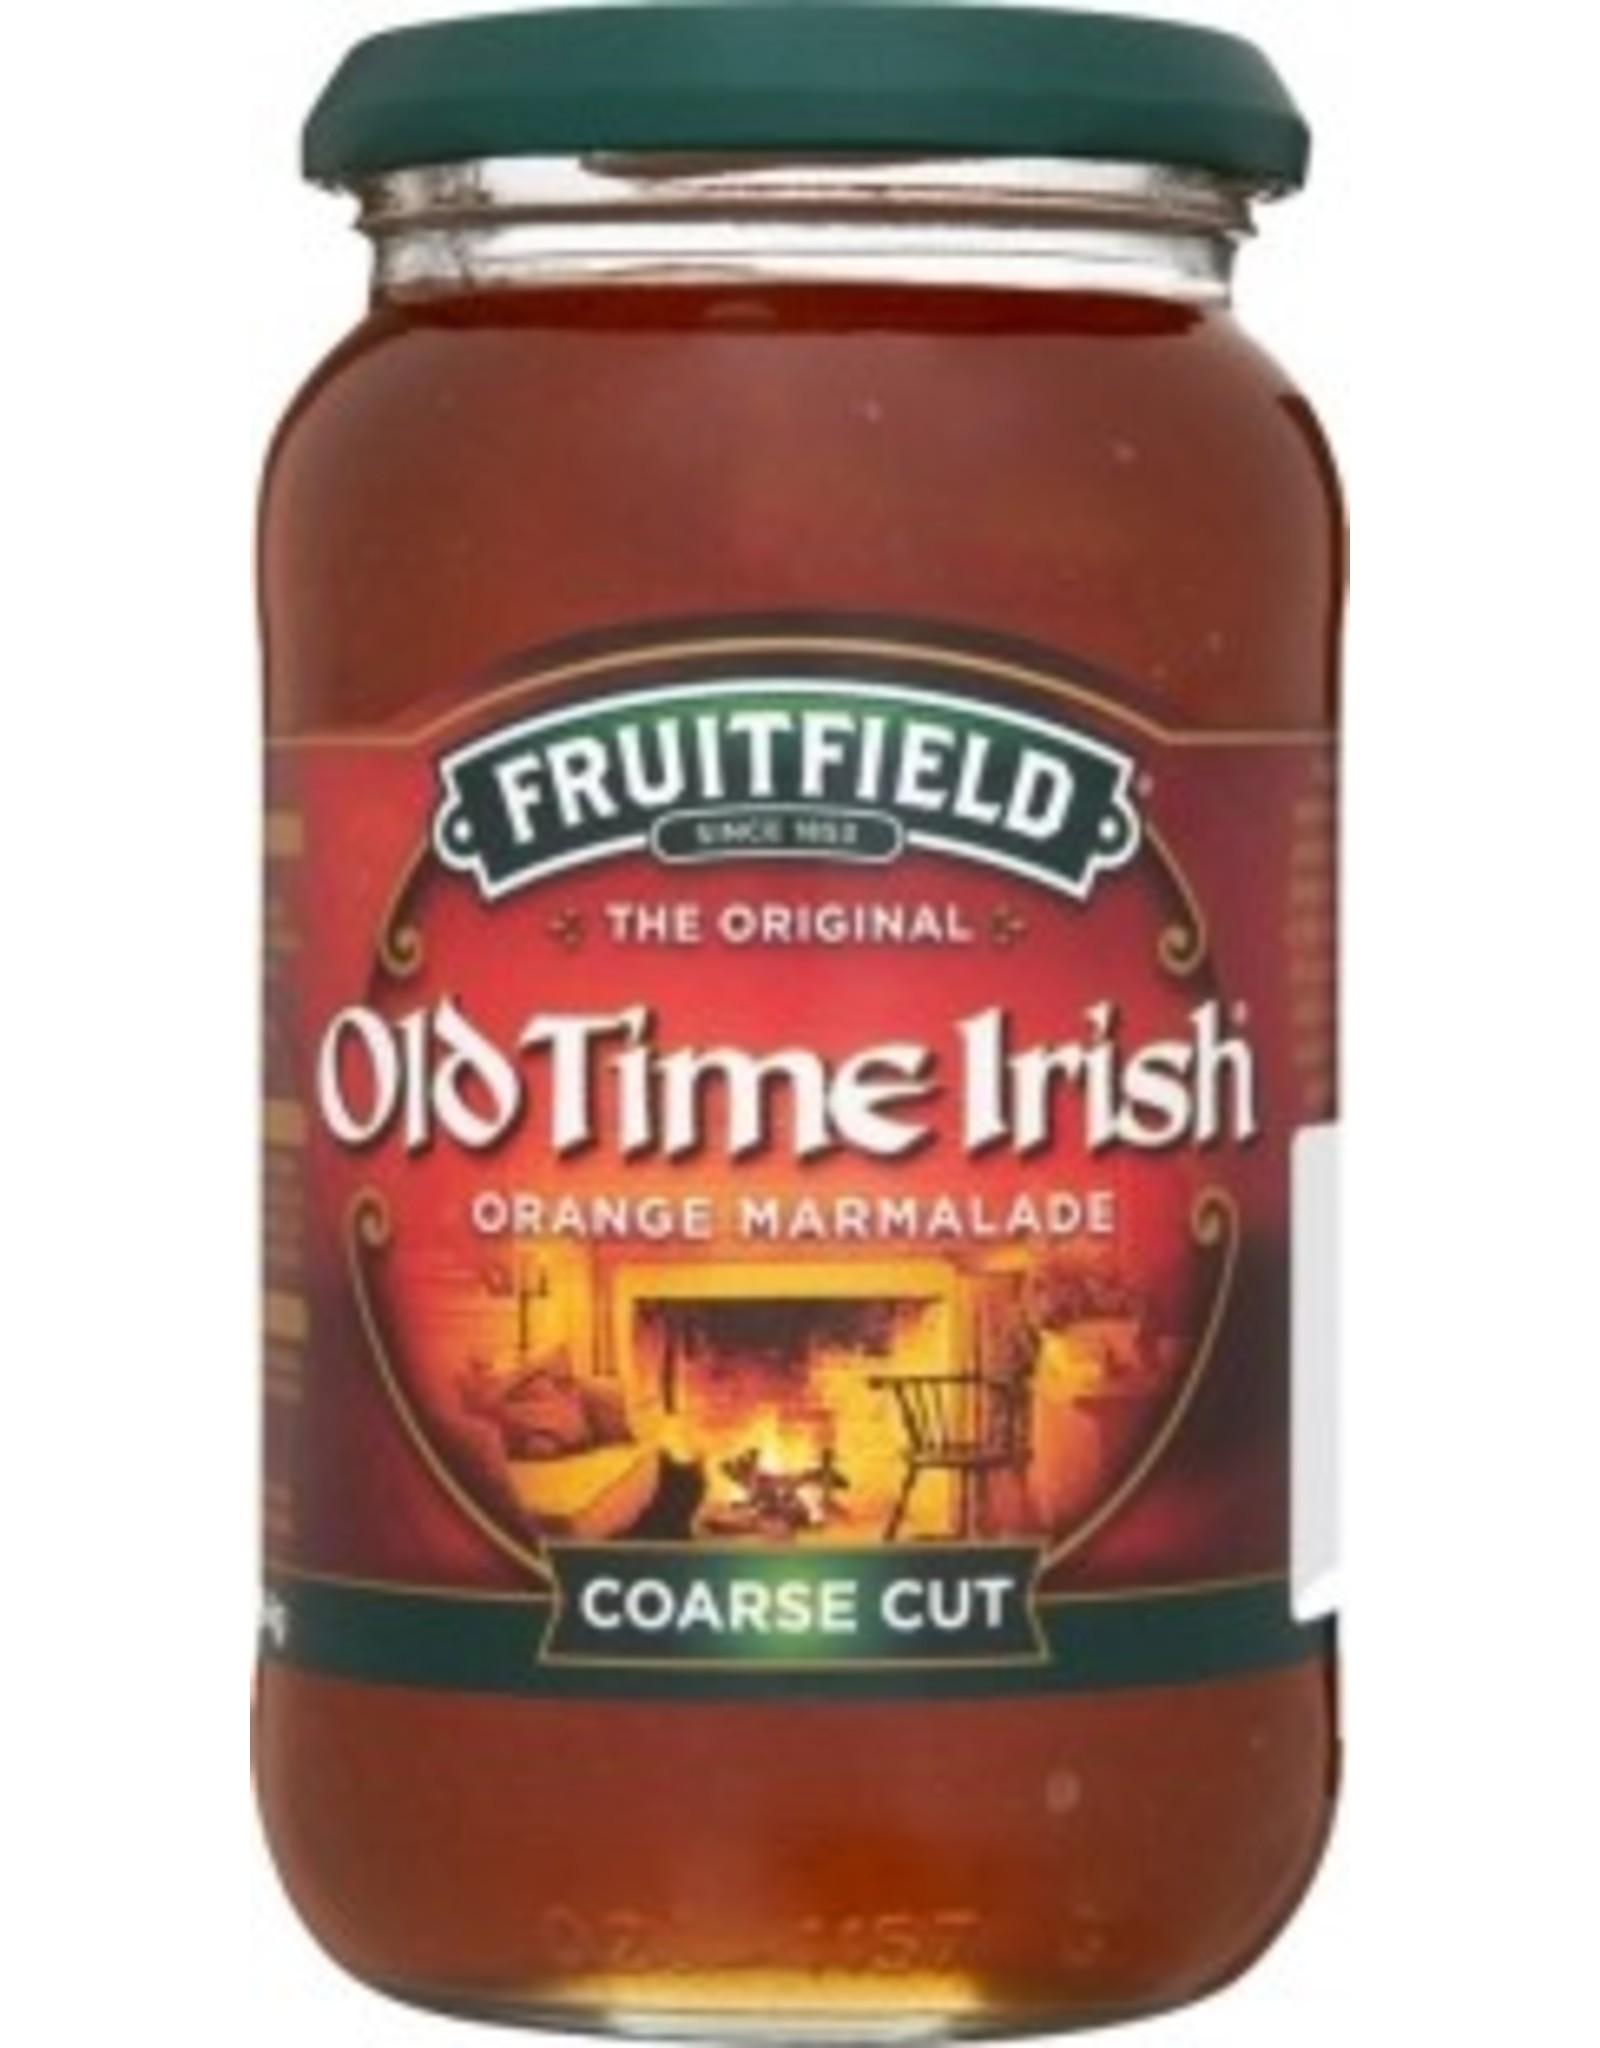 Fruitfield Fruitfield Old Time Irish Coarse Marmalade